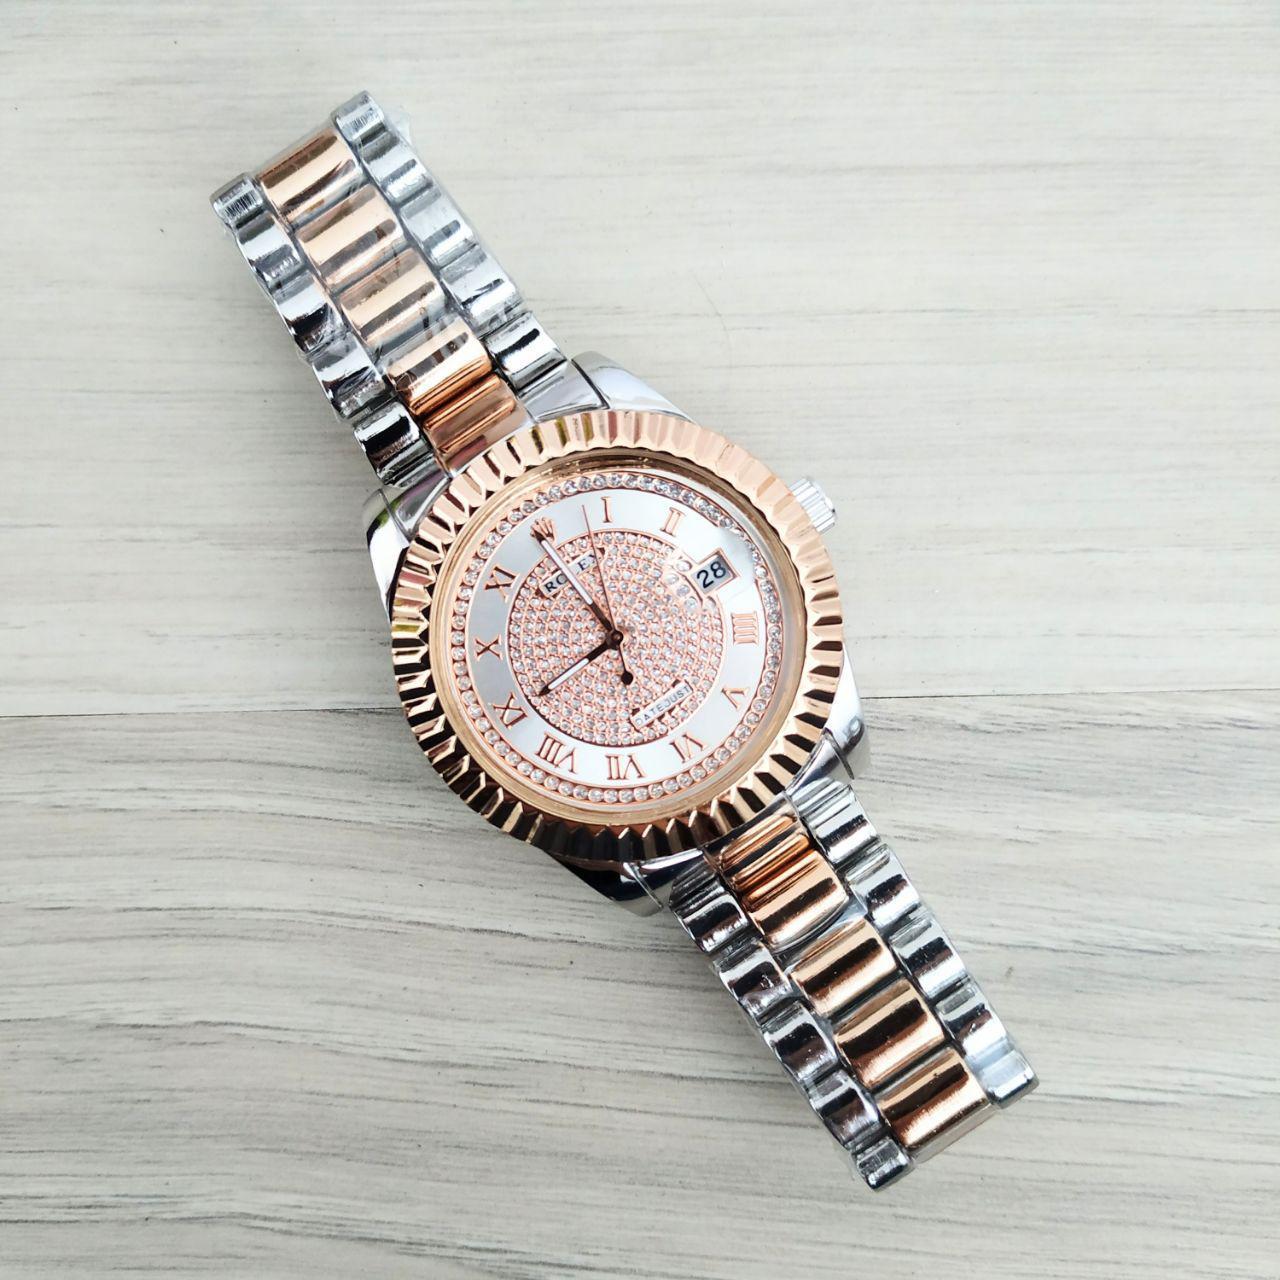 Rolex SKPAN-1020-0779